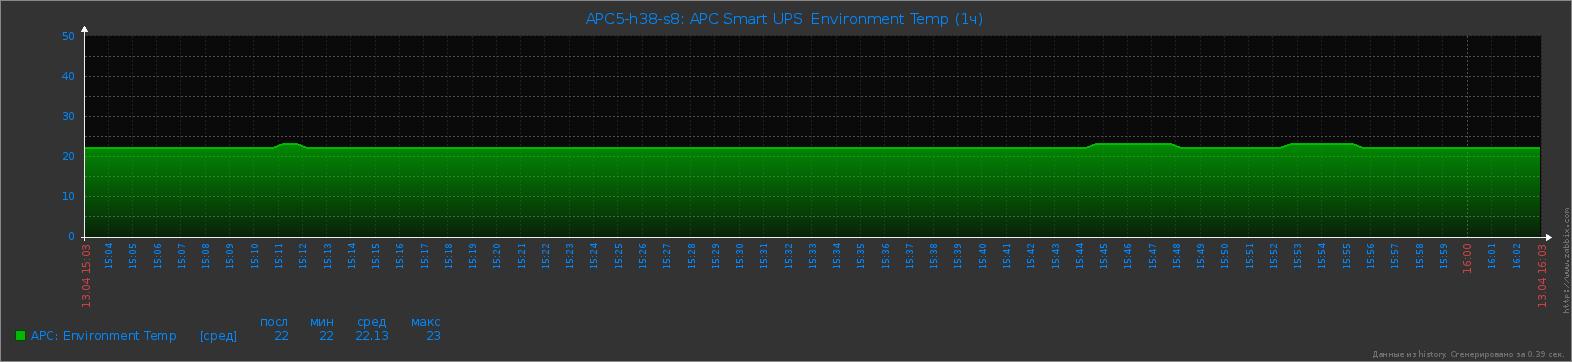 APC Smart UPS - Environment Temp